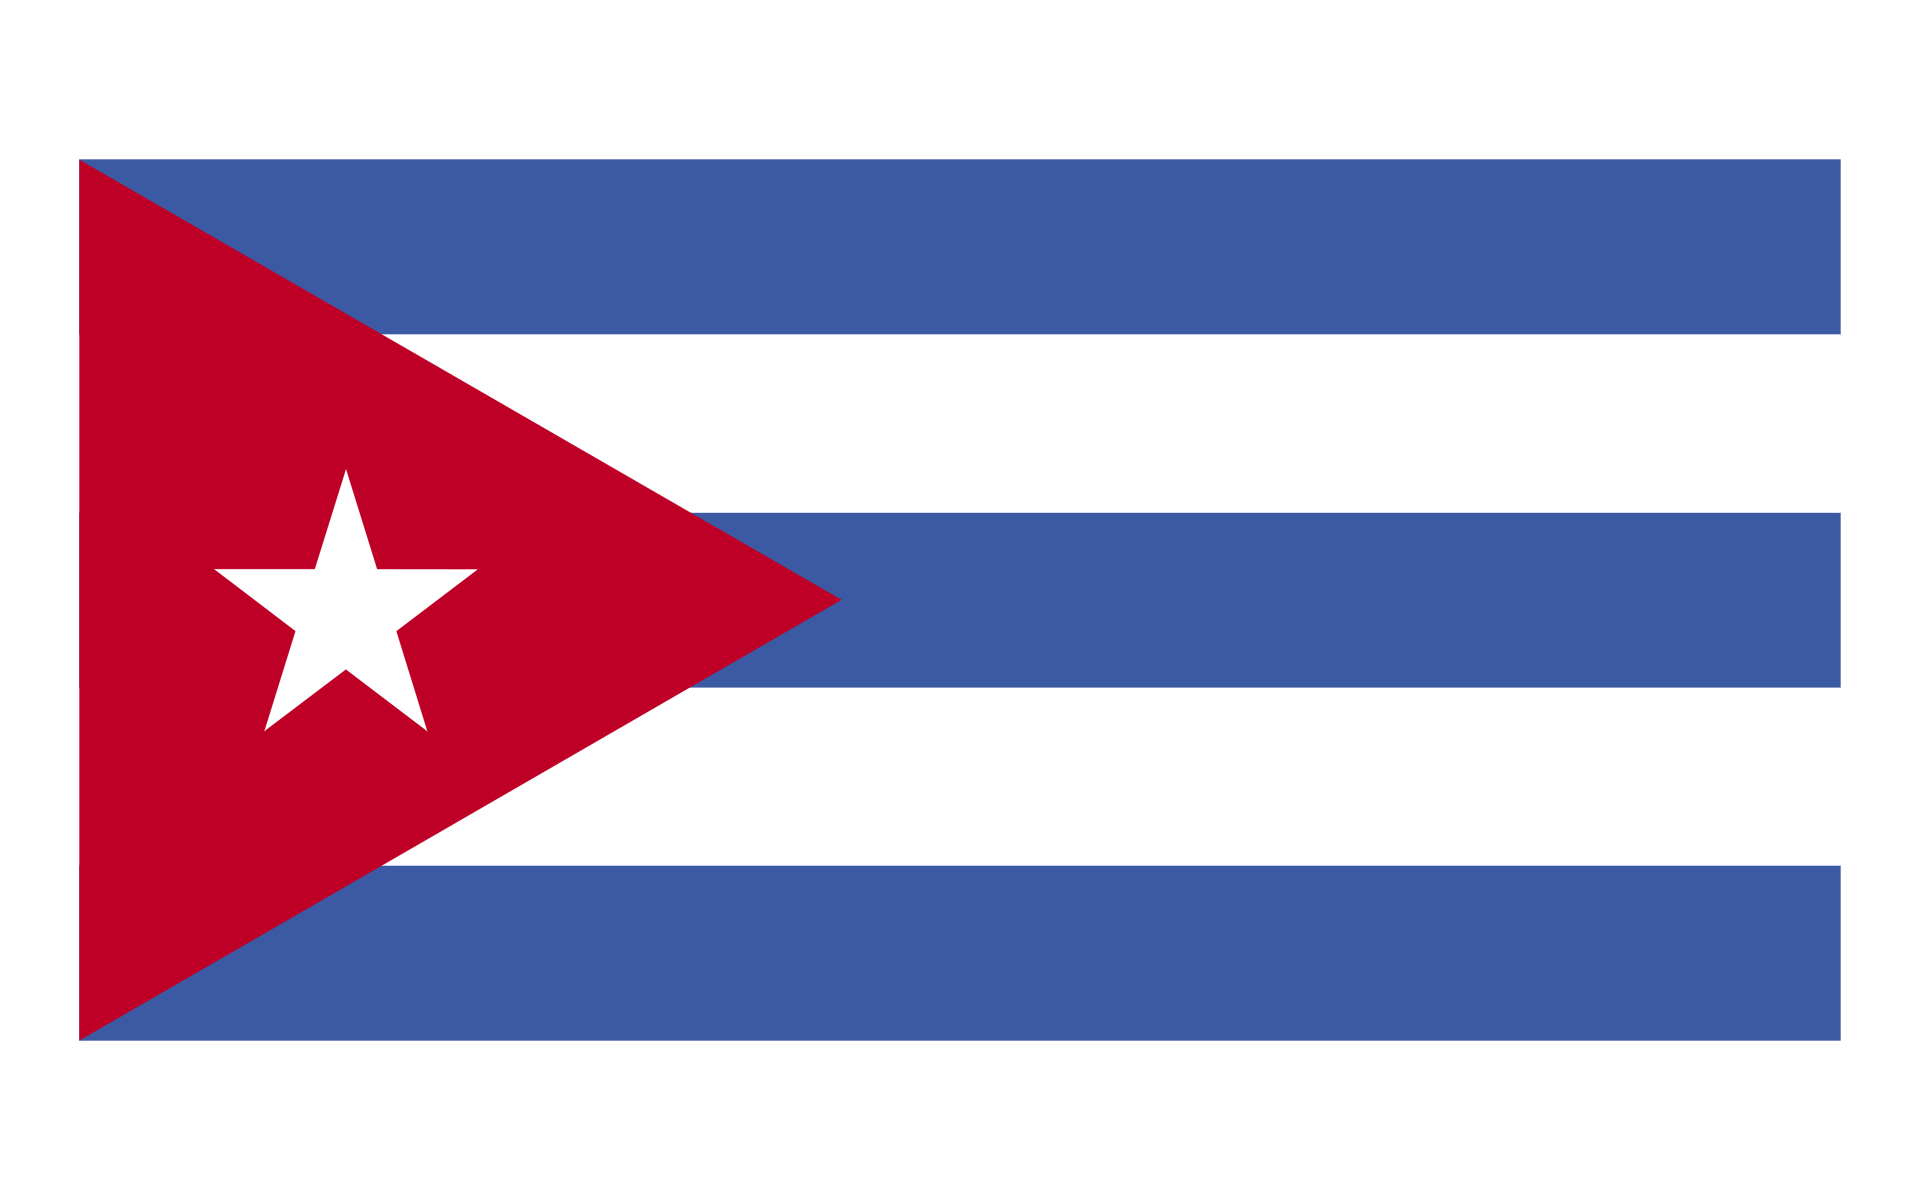 Cuban flag desktop wallpaper Flag wallpapers 1920x1200